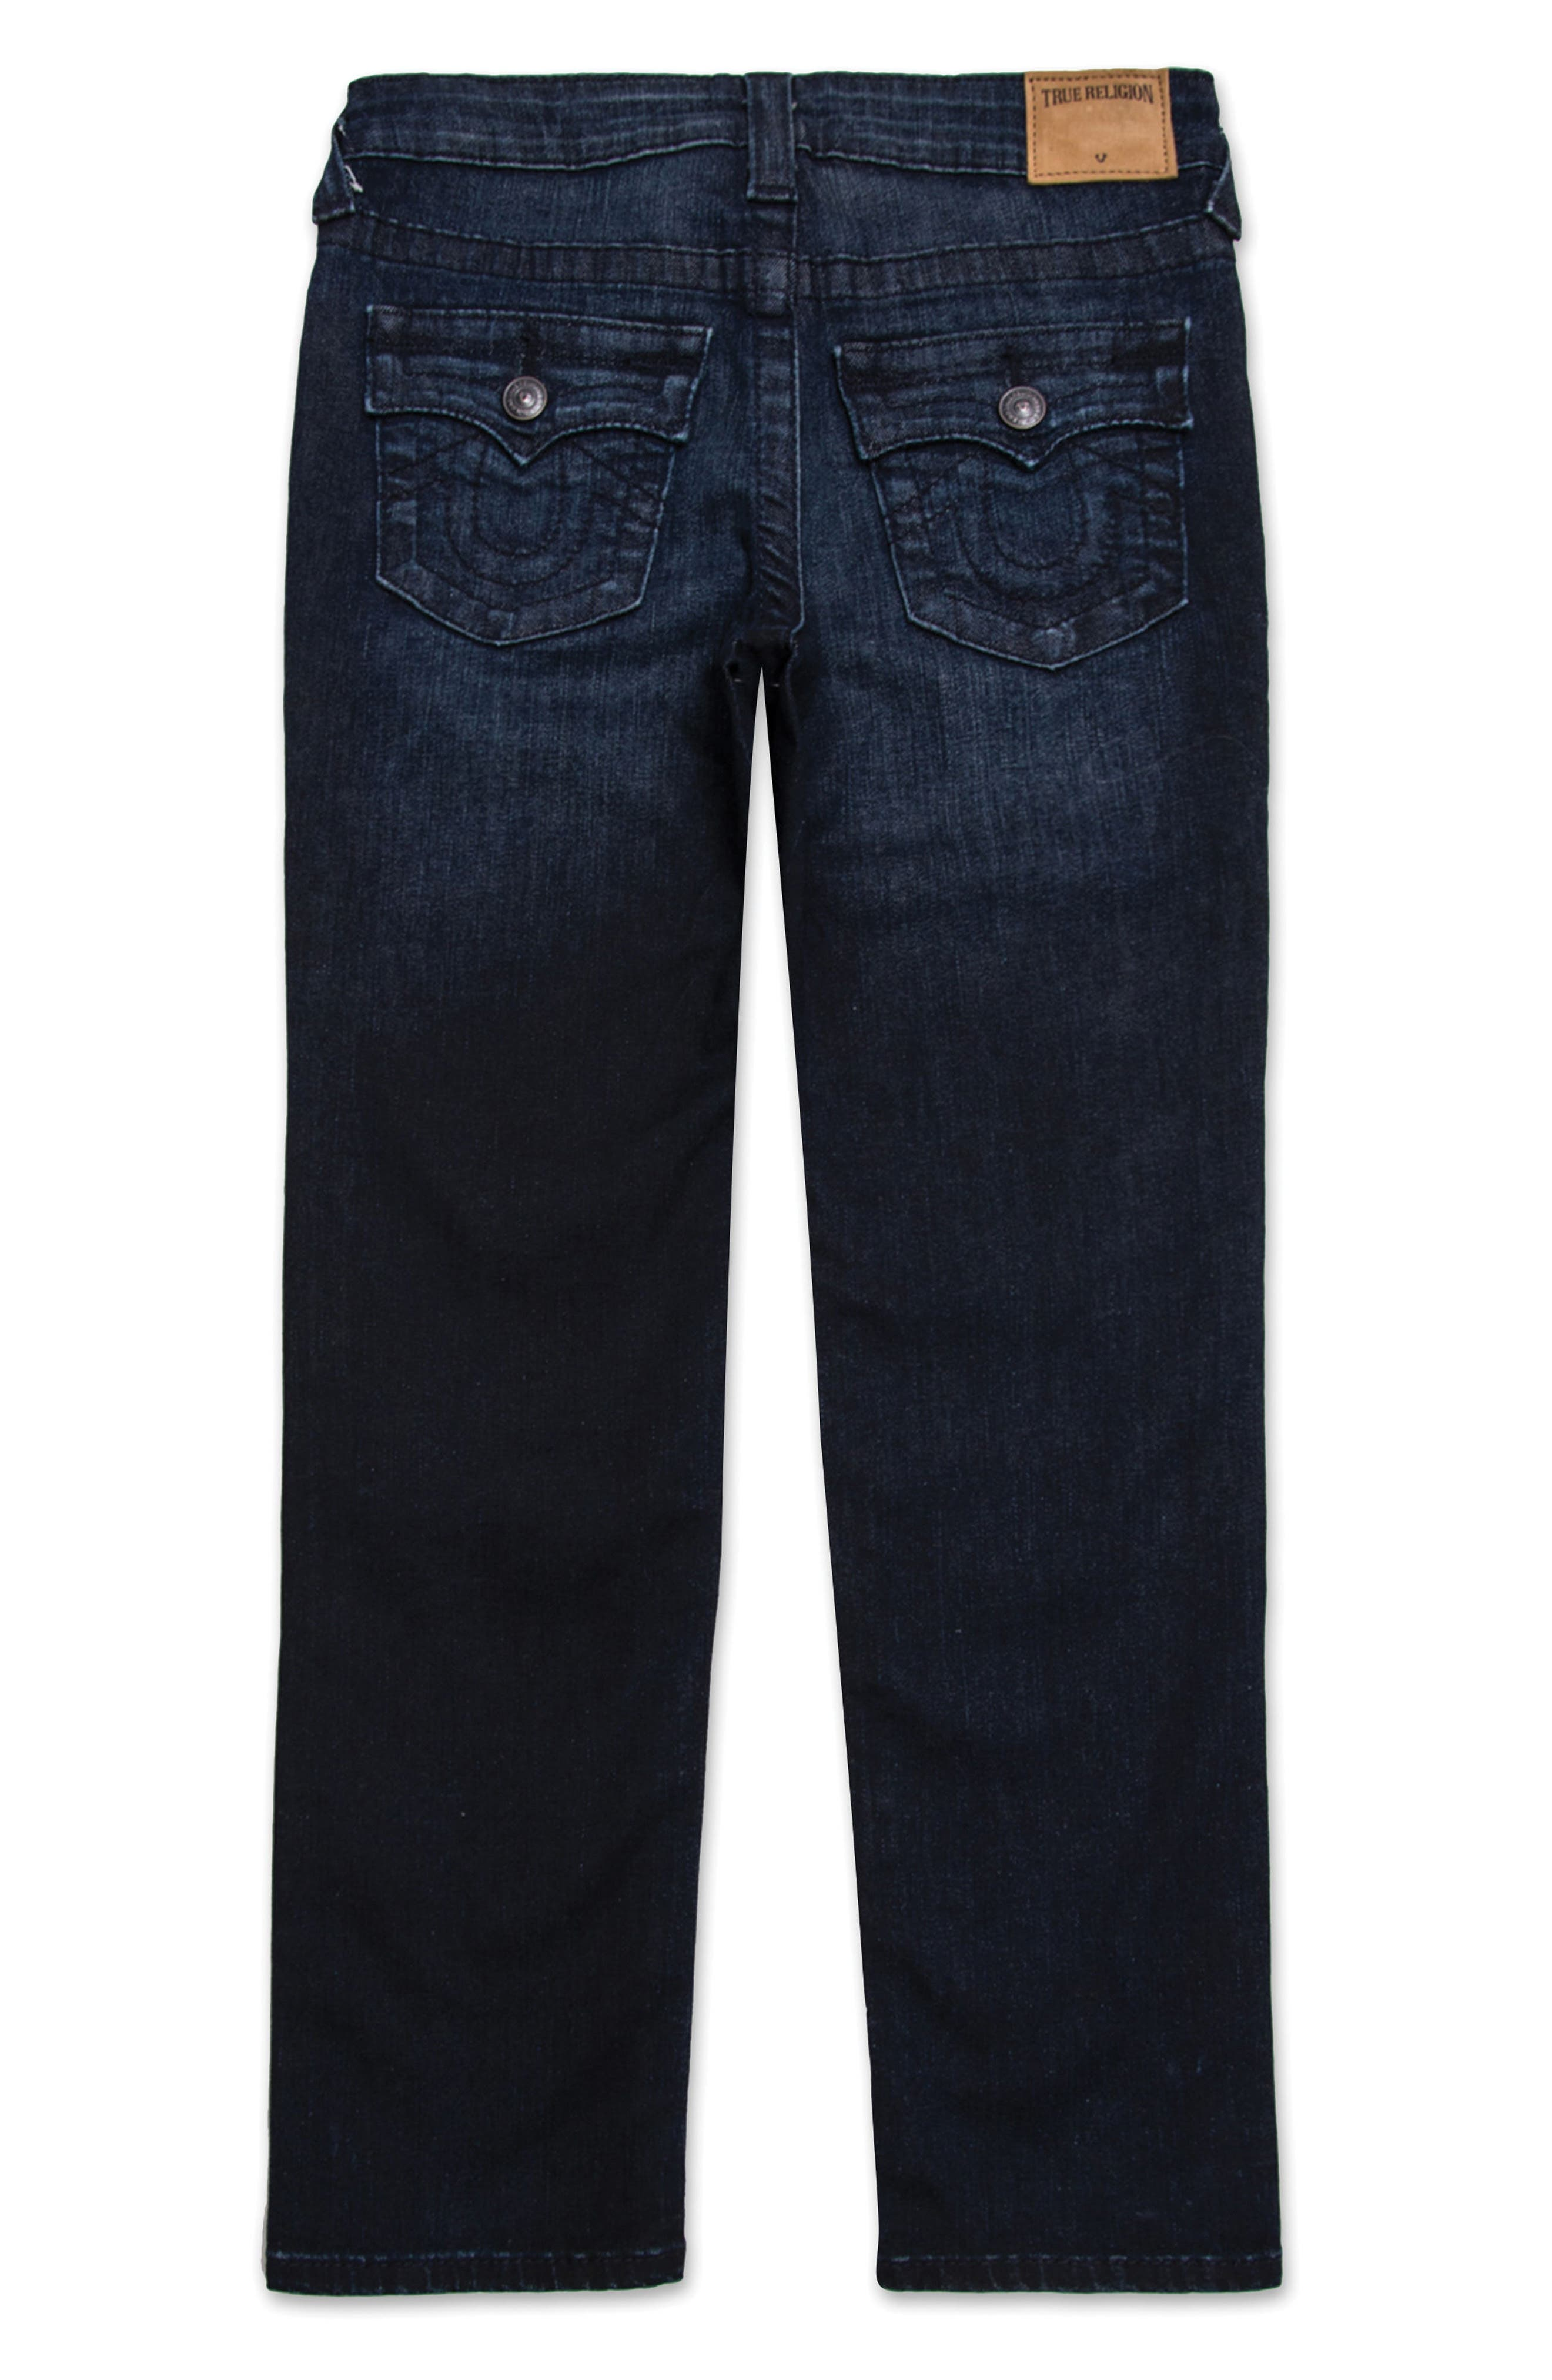 TRUE RELIGION BRAND JEANS, Geno Relaxed Slim Fit Jeans, Main thumbnail 1, color, BLUE ASPHALT WASH